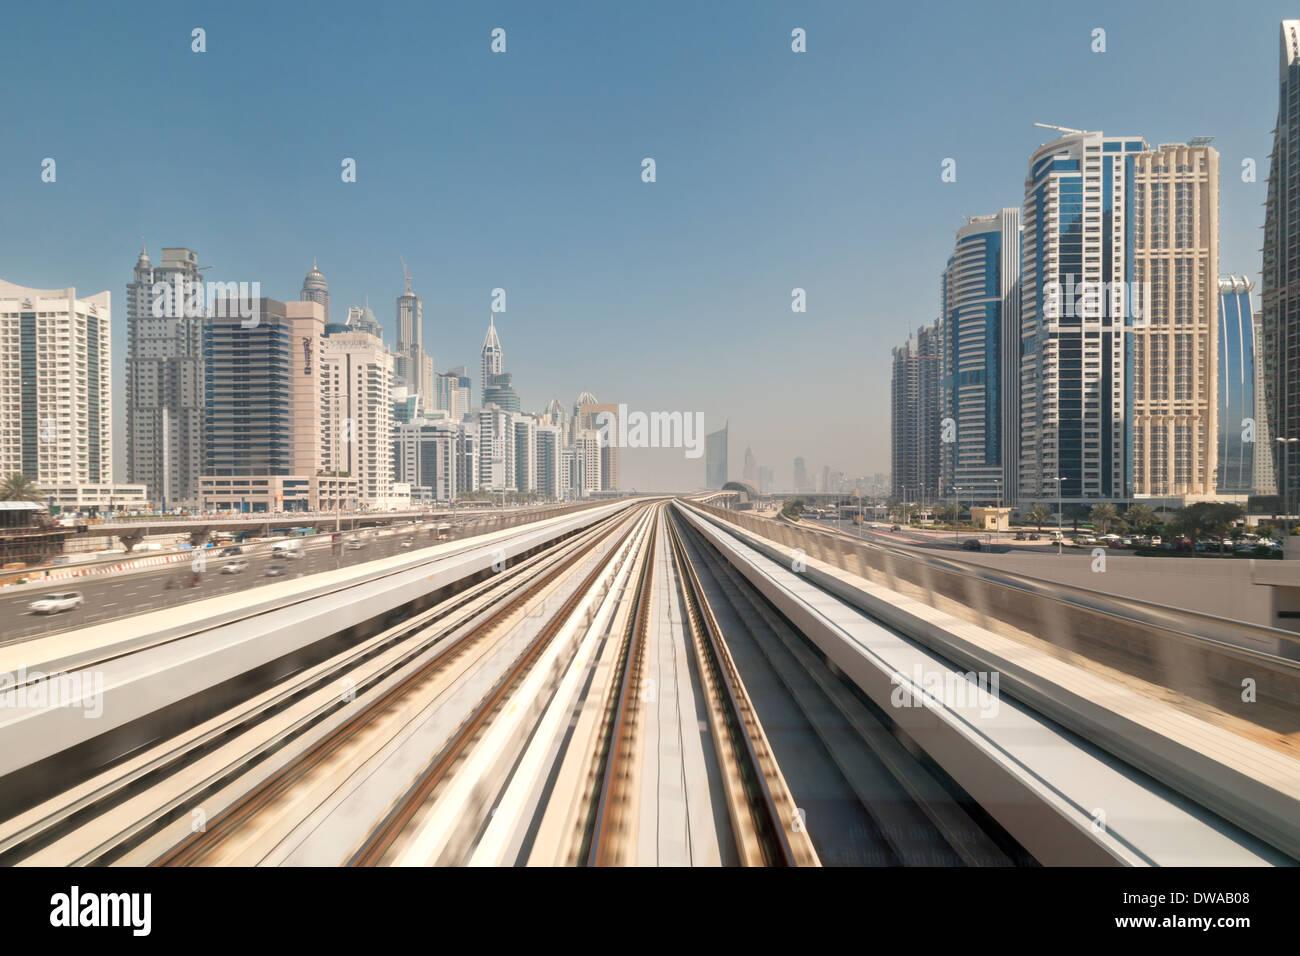 dubai-metro-speed-blur-of-the-track-when-the-train-is-in-motion-dubai-DWAB08.jpg